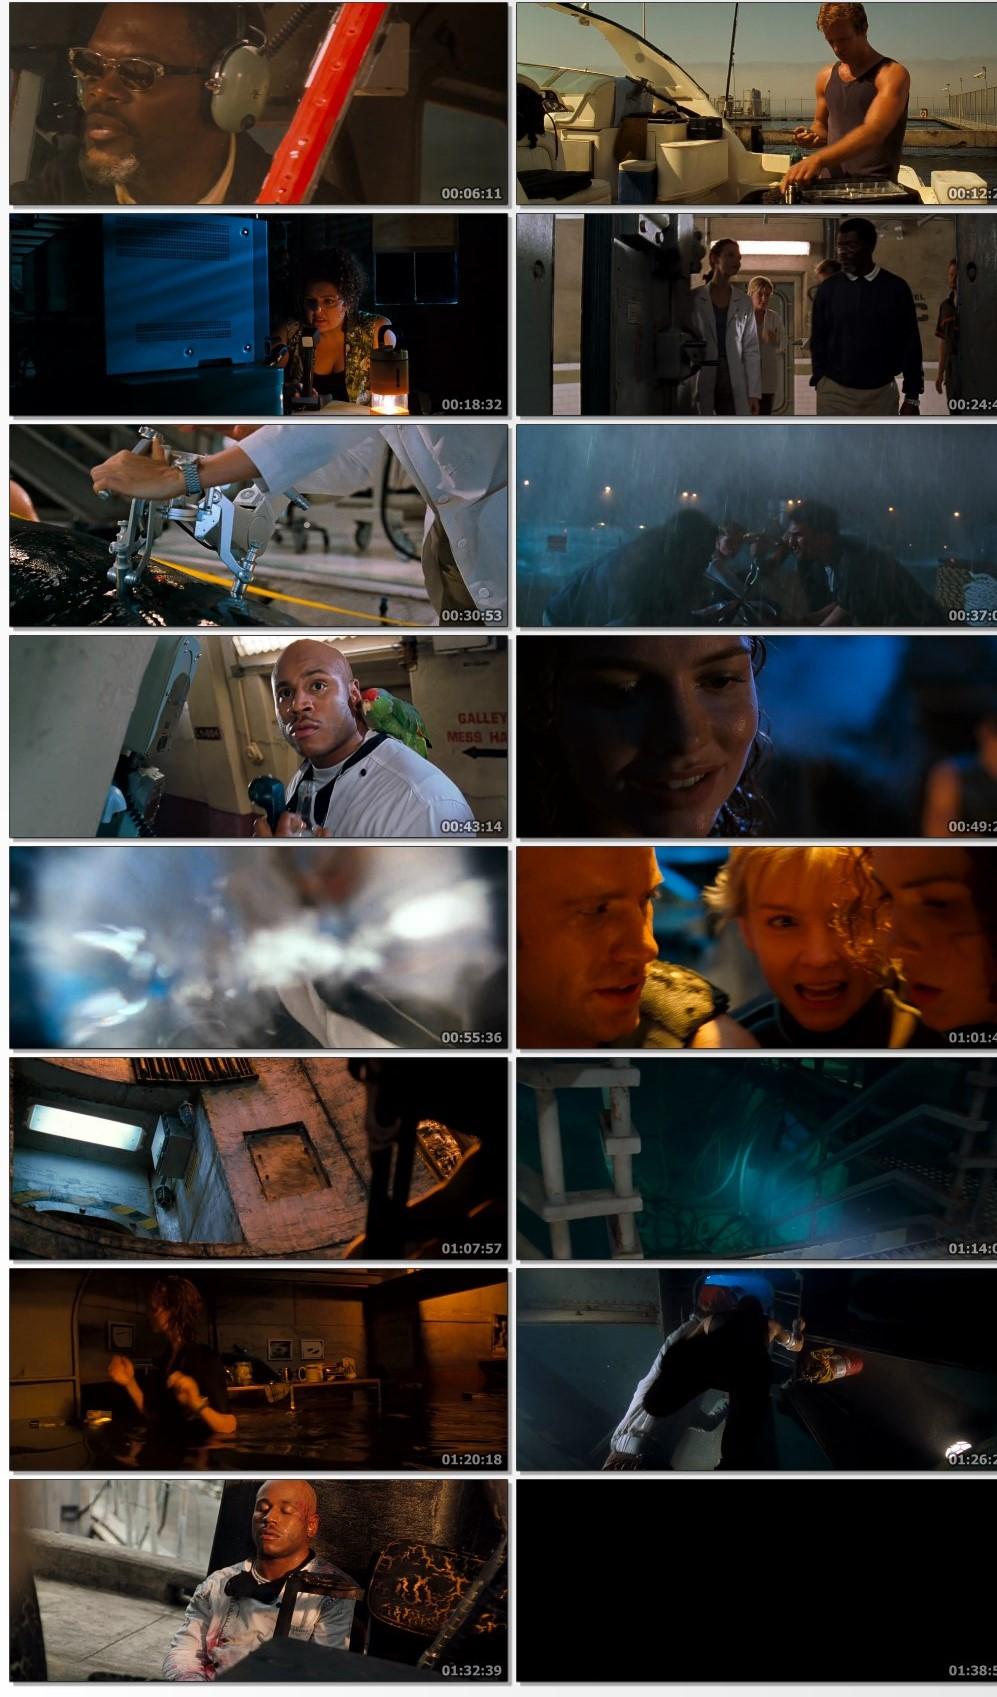 Deep-Blue-Sea-1999-www-9kmovies-work-Hindi-ORG-Dual-Audio-720p-Blu-Ray-ESub-1-GB-mkv-thumbsc7ee01206